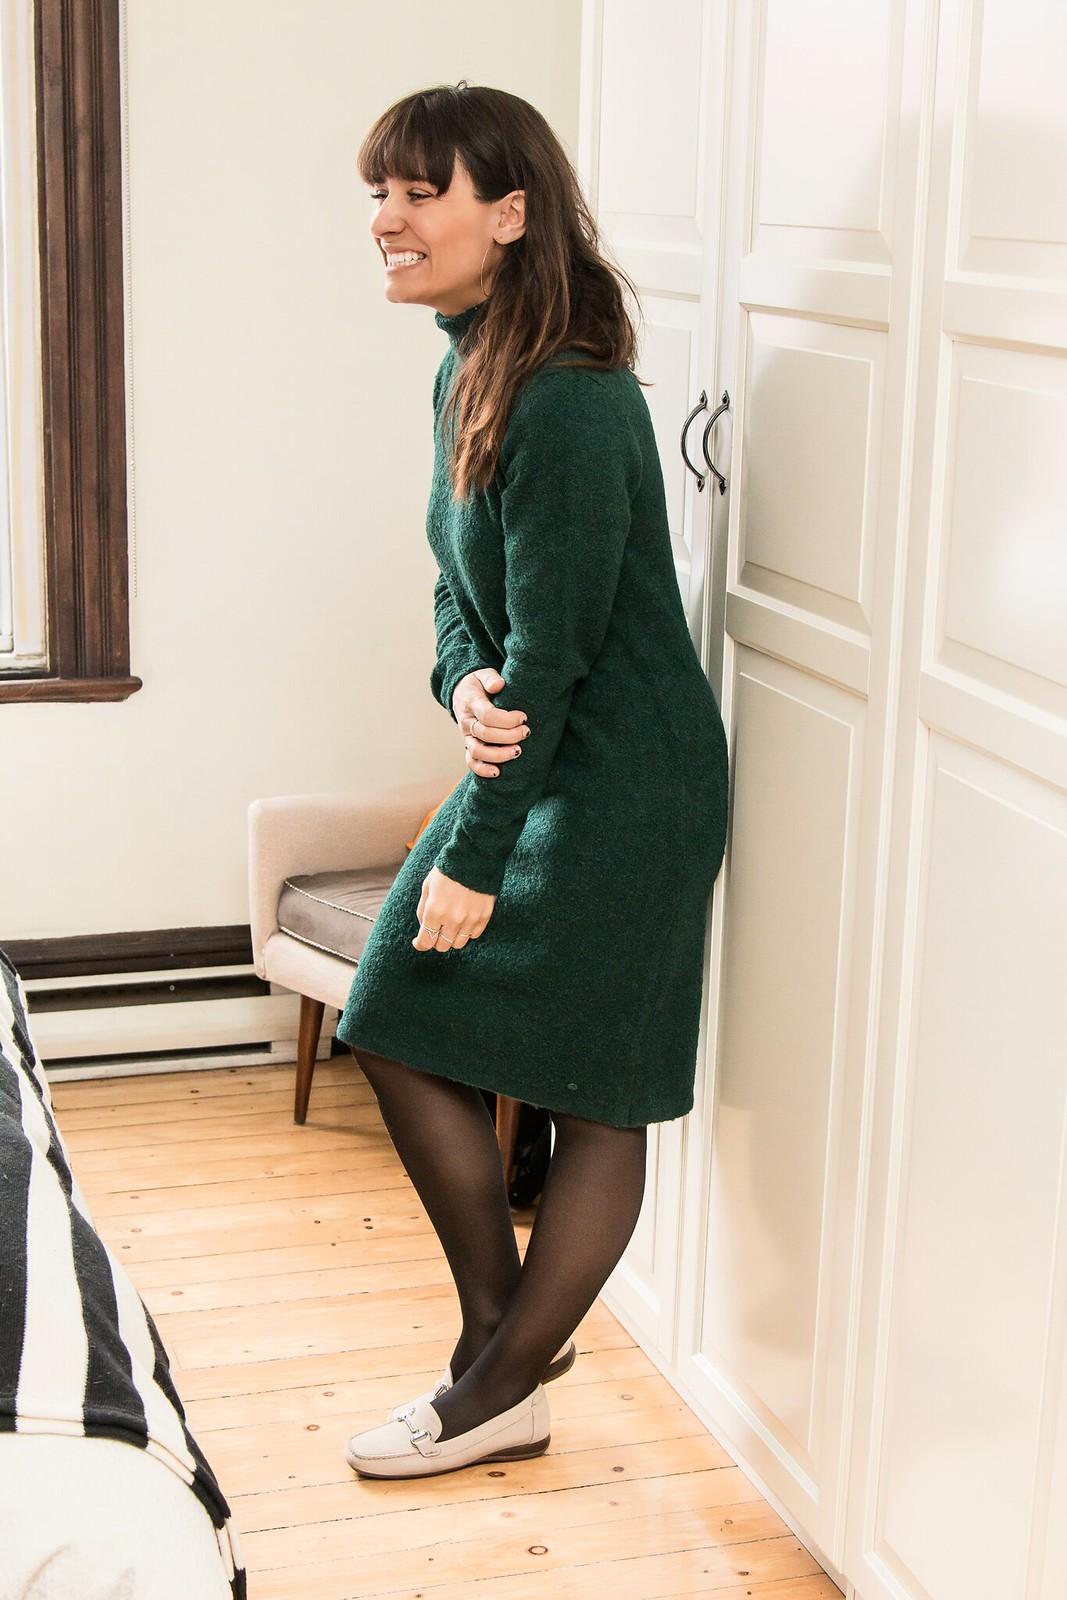 robe verte en tricot